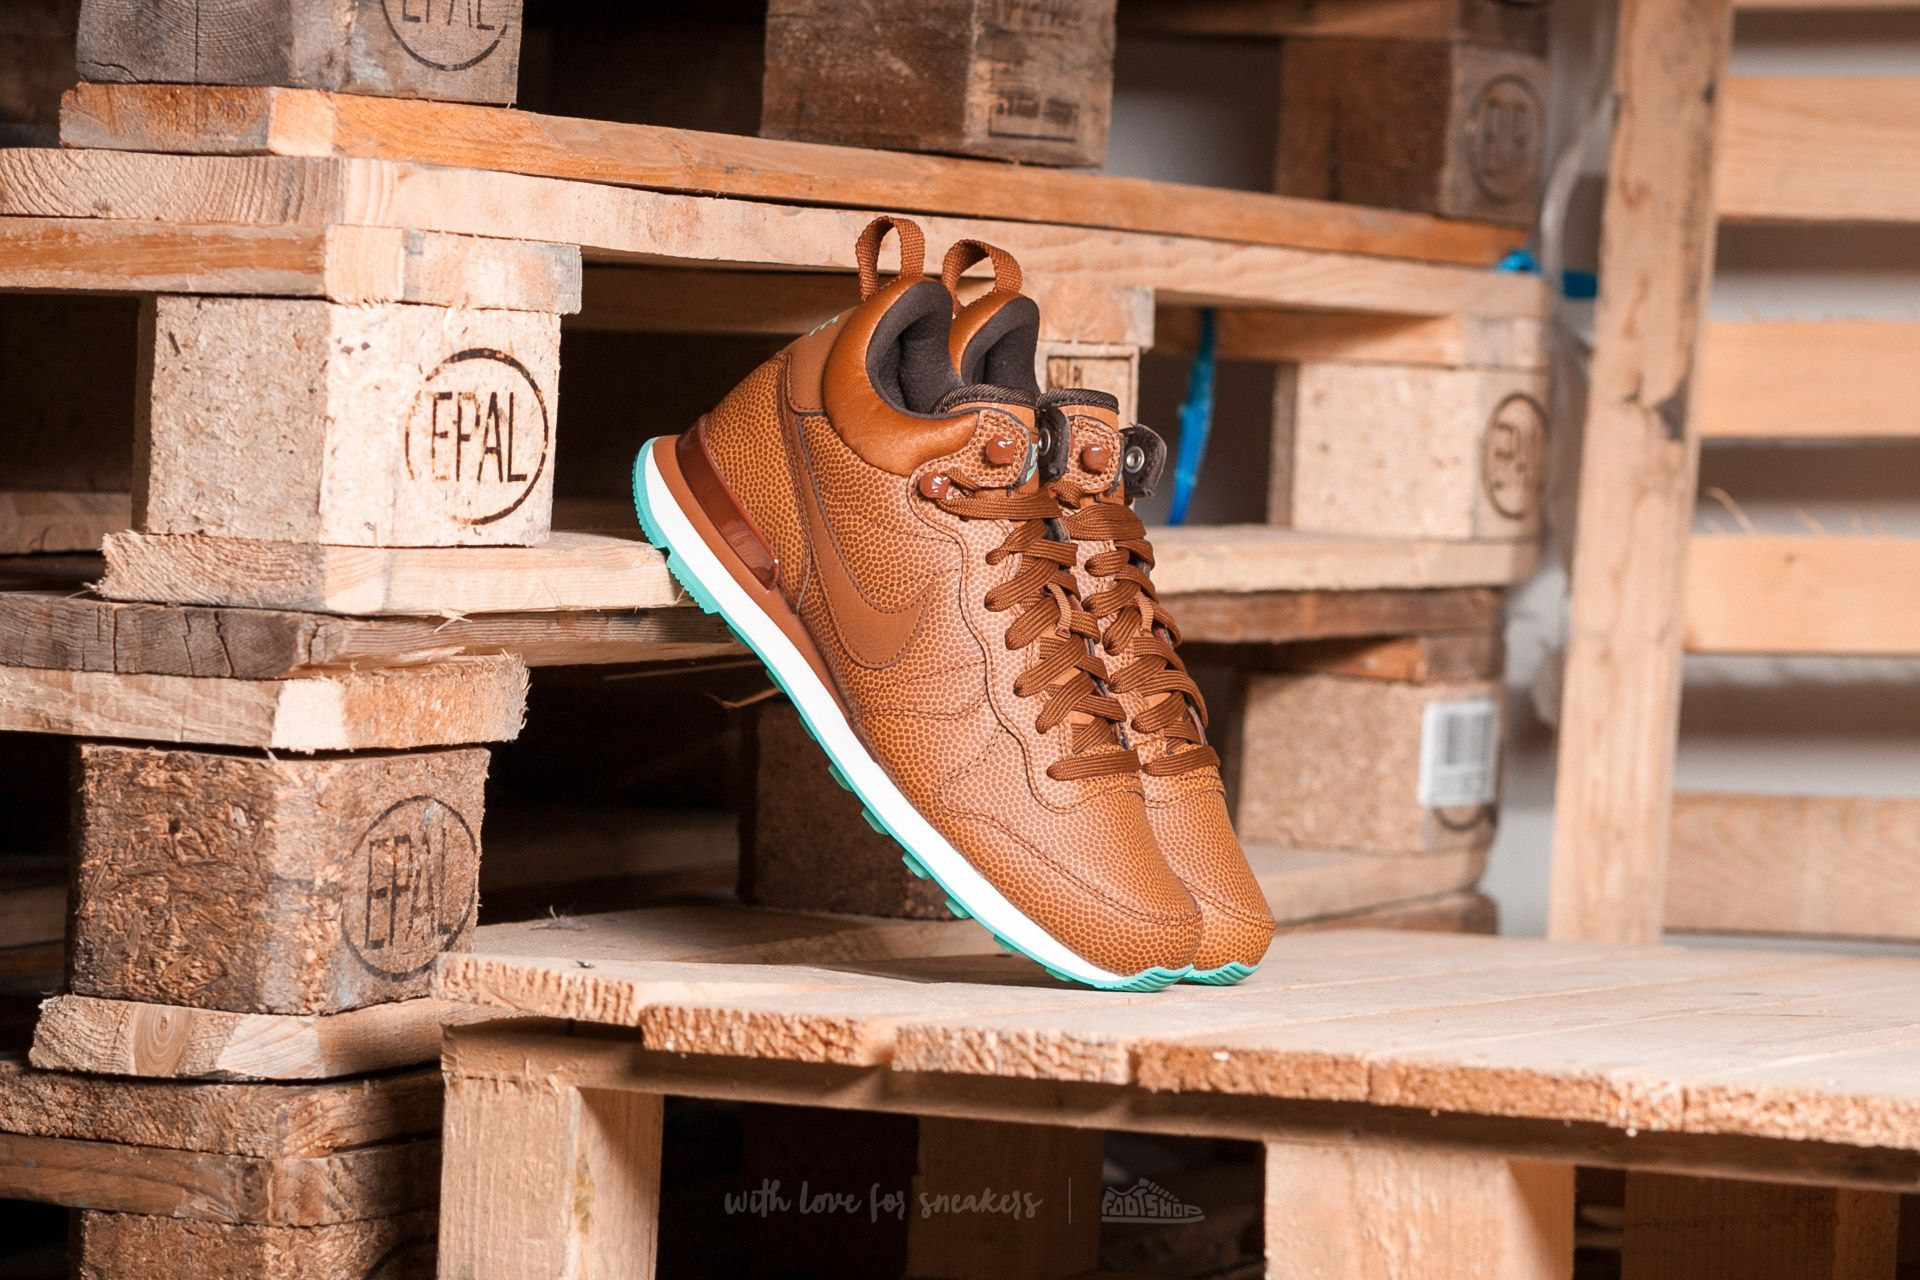 f7fc2b37c5f8 Nike W Internationalist Mid Leather Hazelnut  Hazelnut-Washed Teal ...